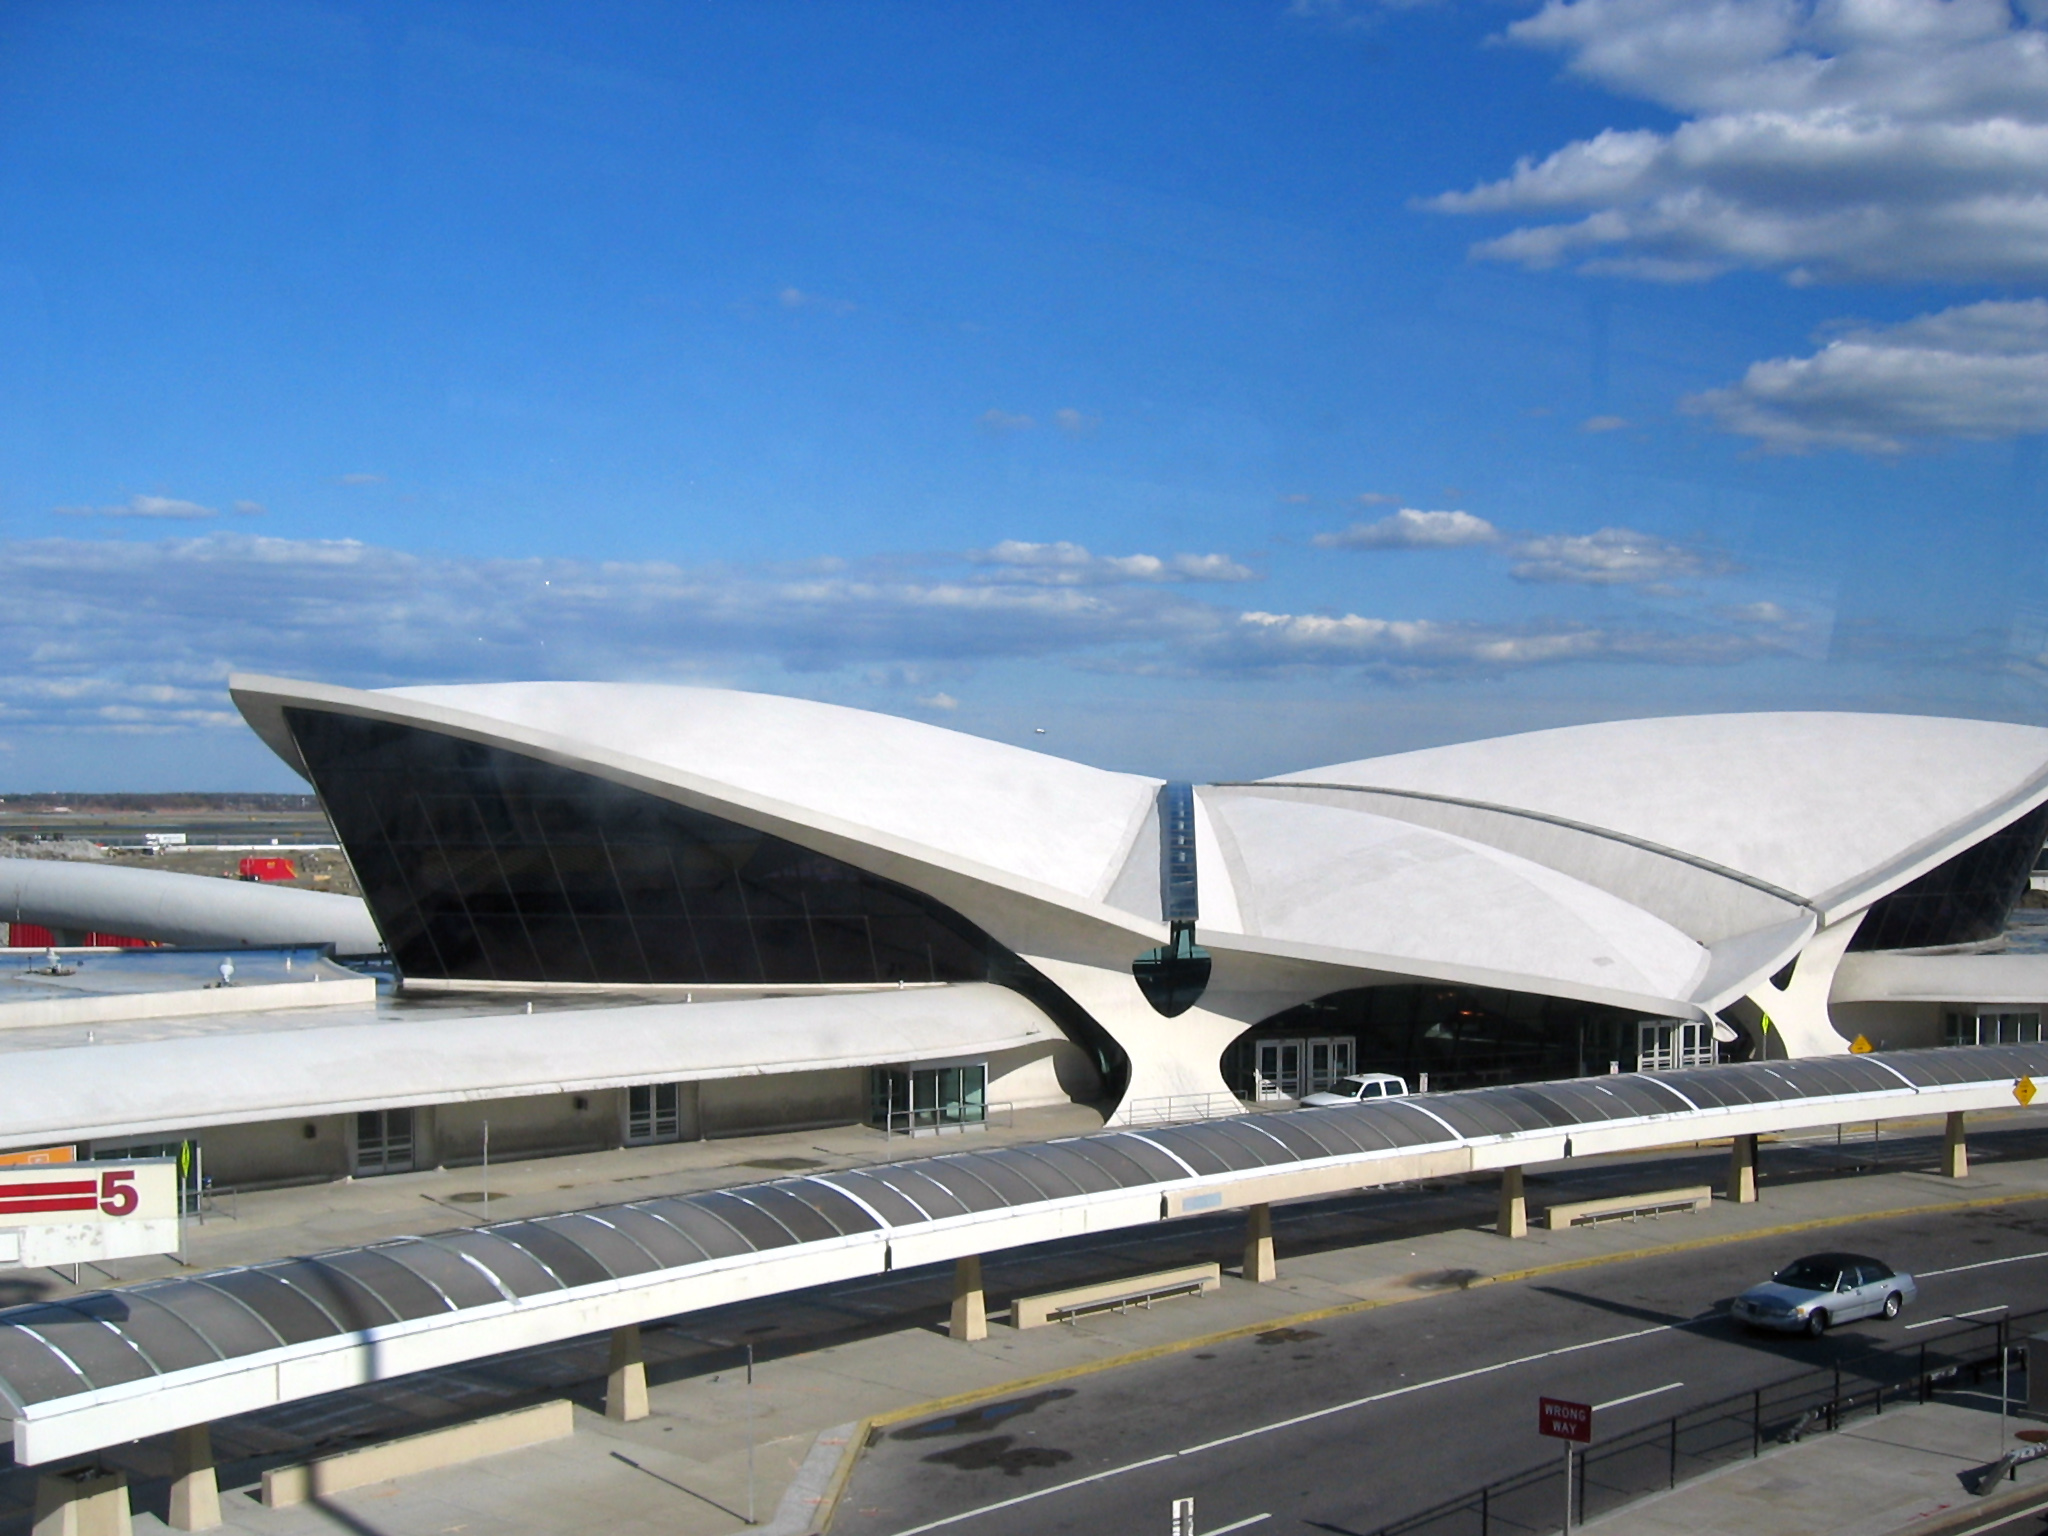 TWA Terminal at John F. Kennedy International Airport